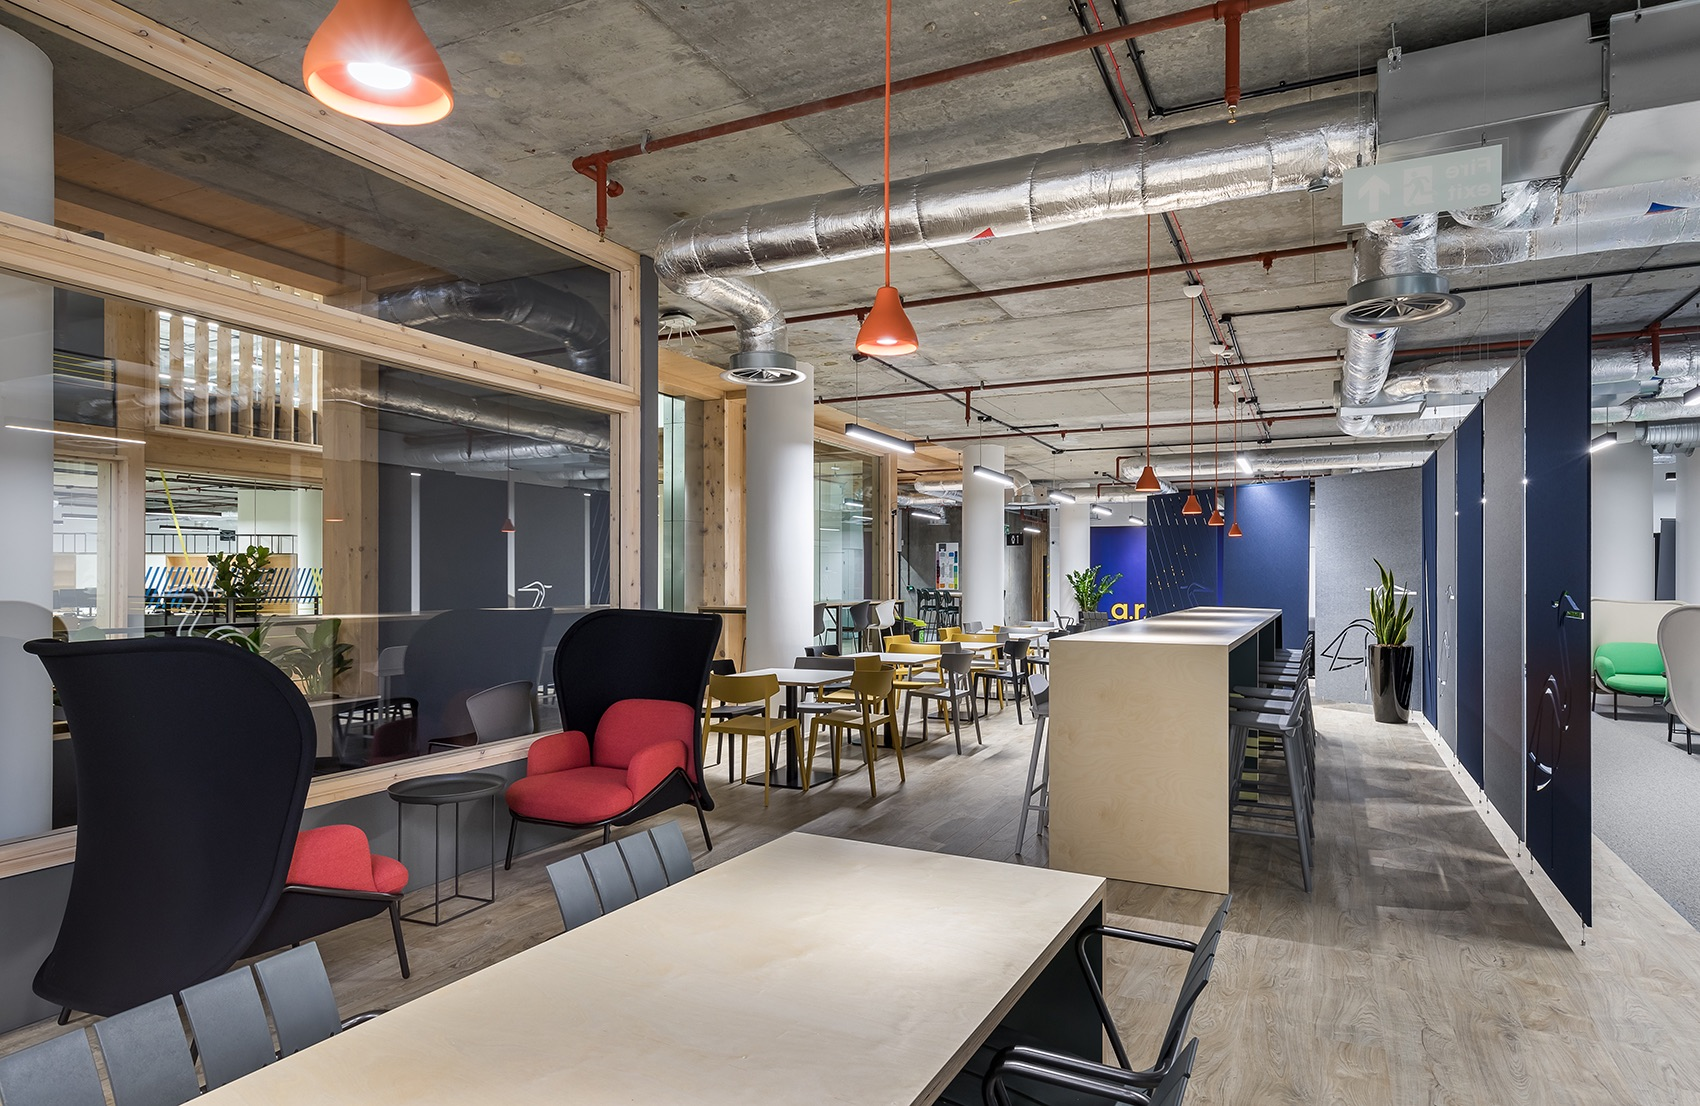 anglia-ruskin-university-office-london-9